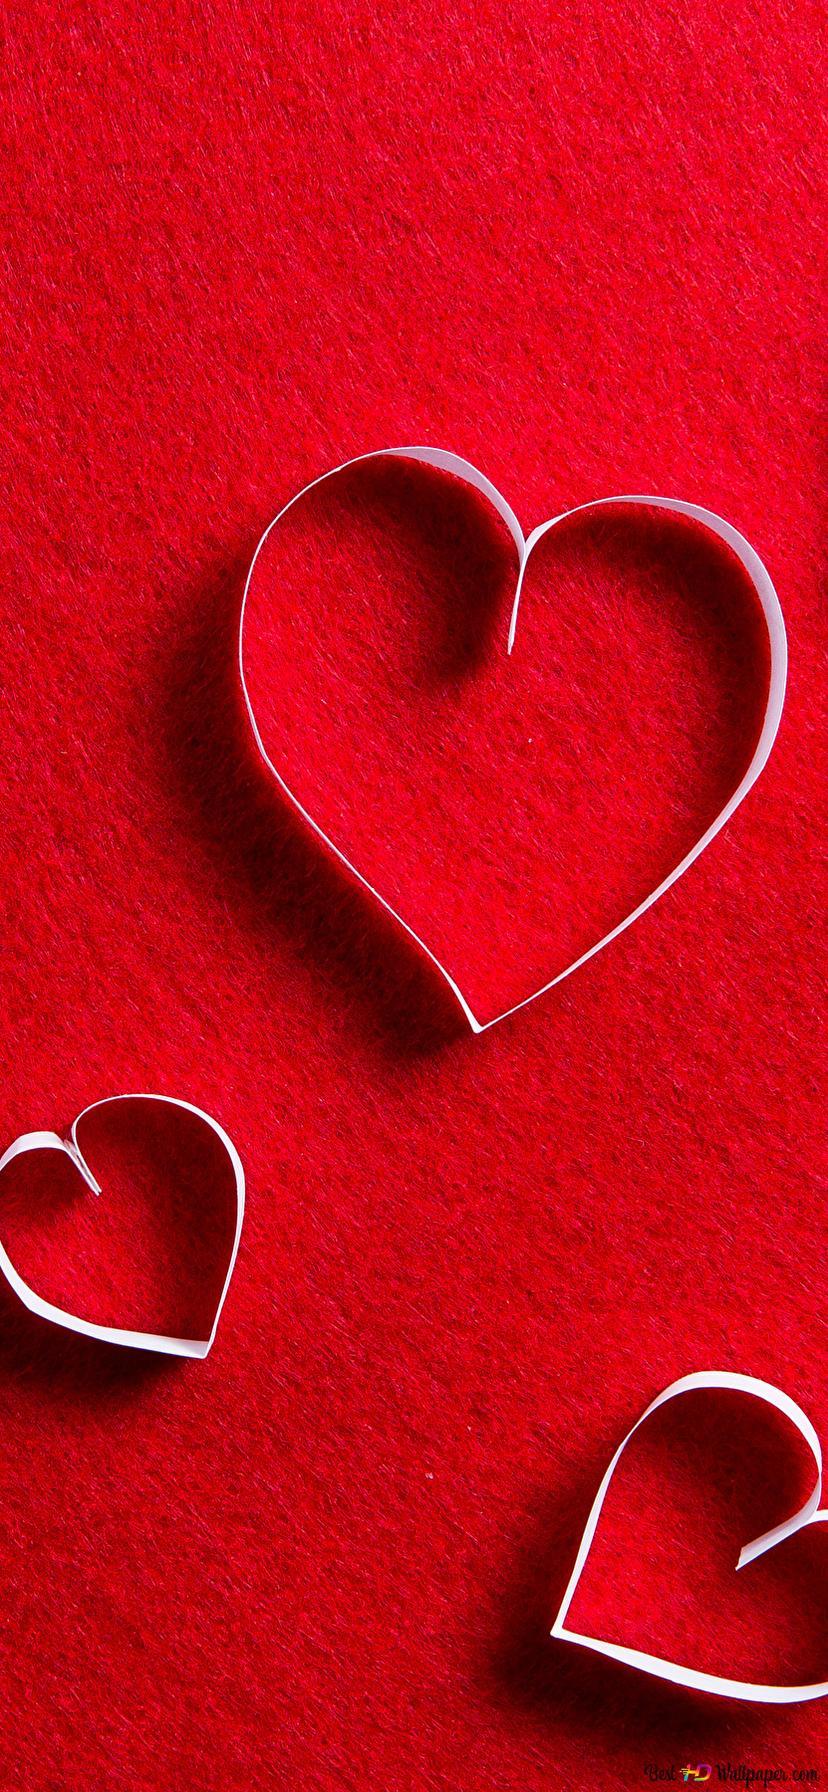 Sfondi gratis per pc san valentino